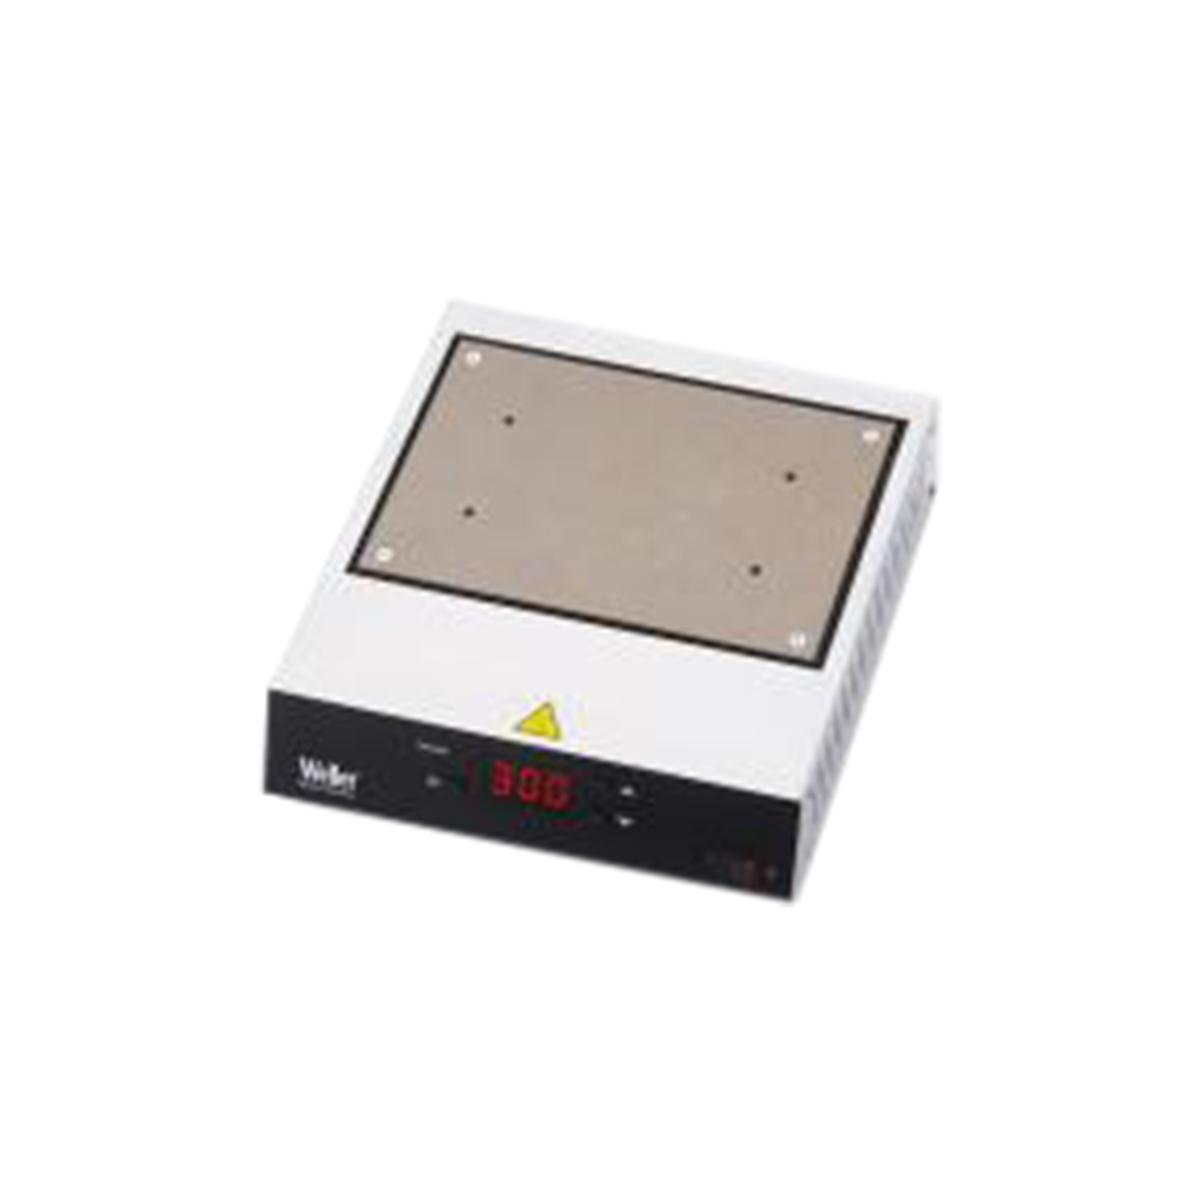 HEATING PLATE 1000 W F (CEE 7/4)